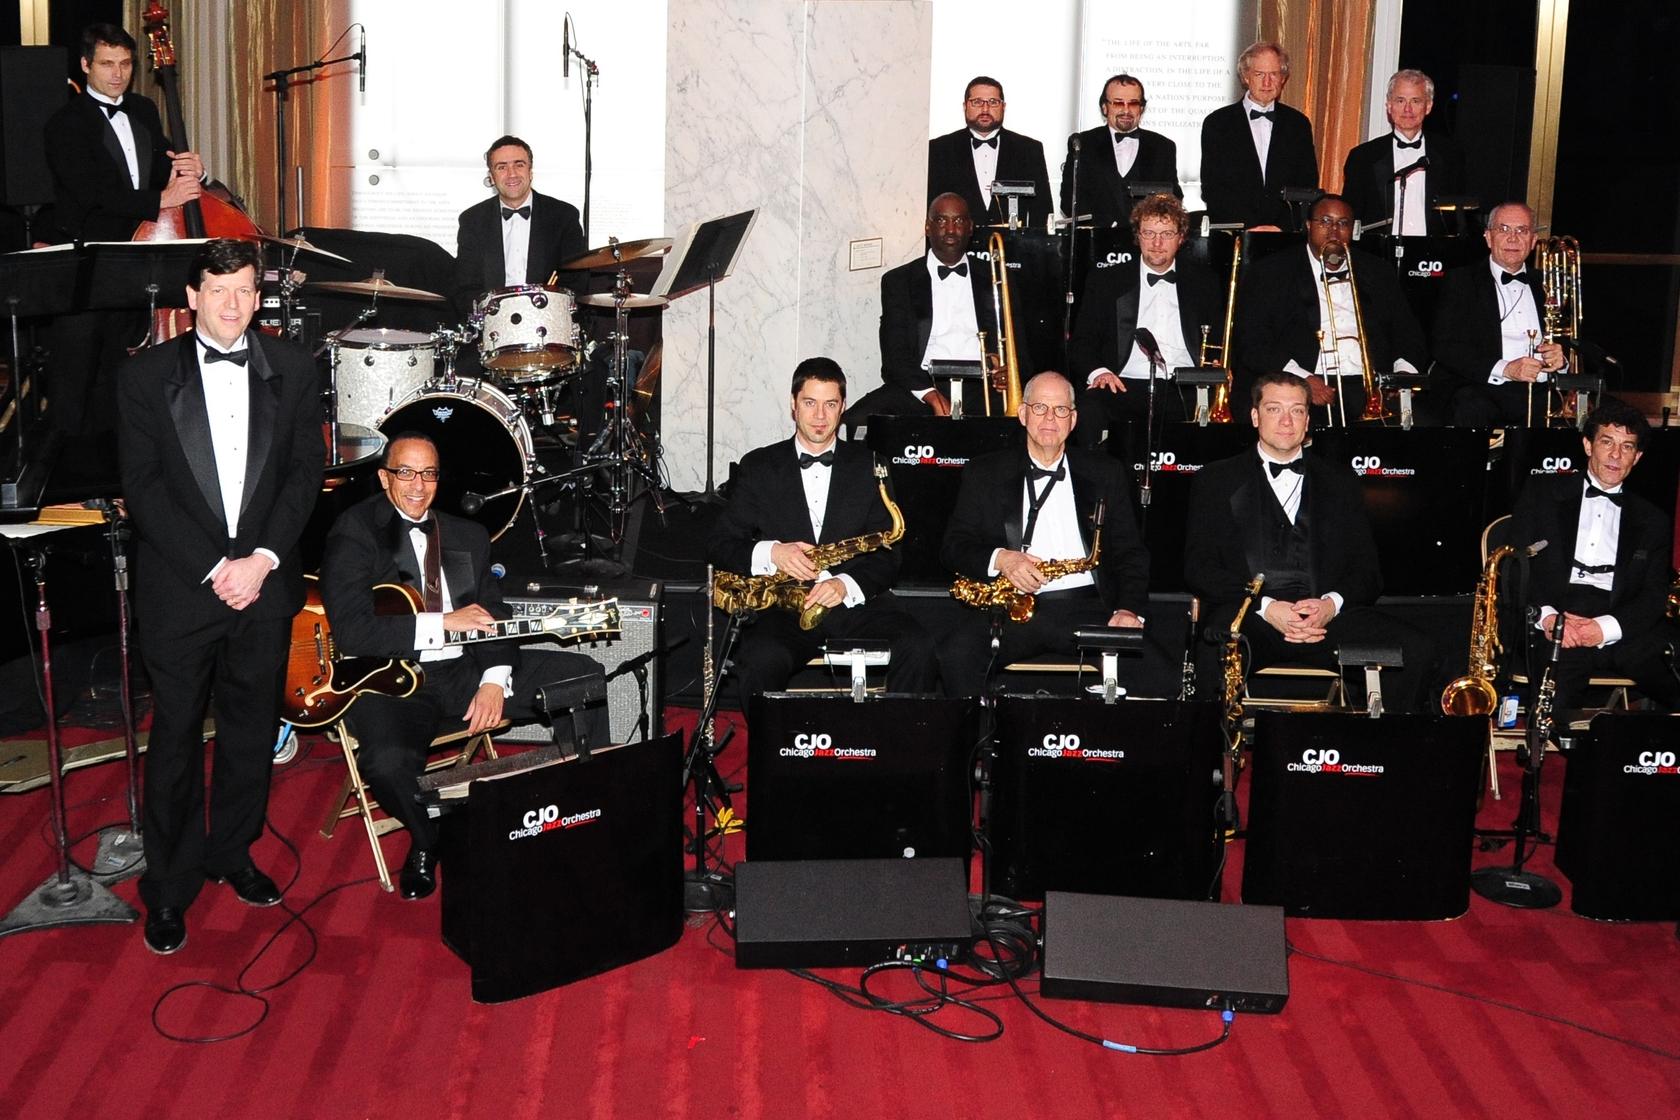 Chicago Jazz Orchestra - Sunday, September 25, 5:00-6:00pmWest Stage